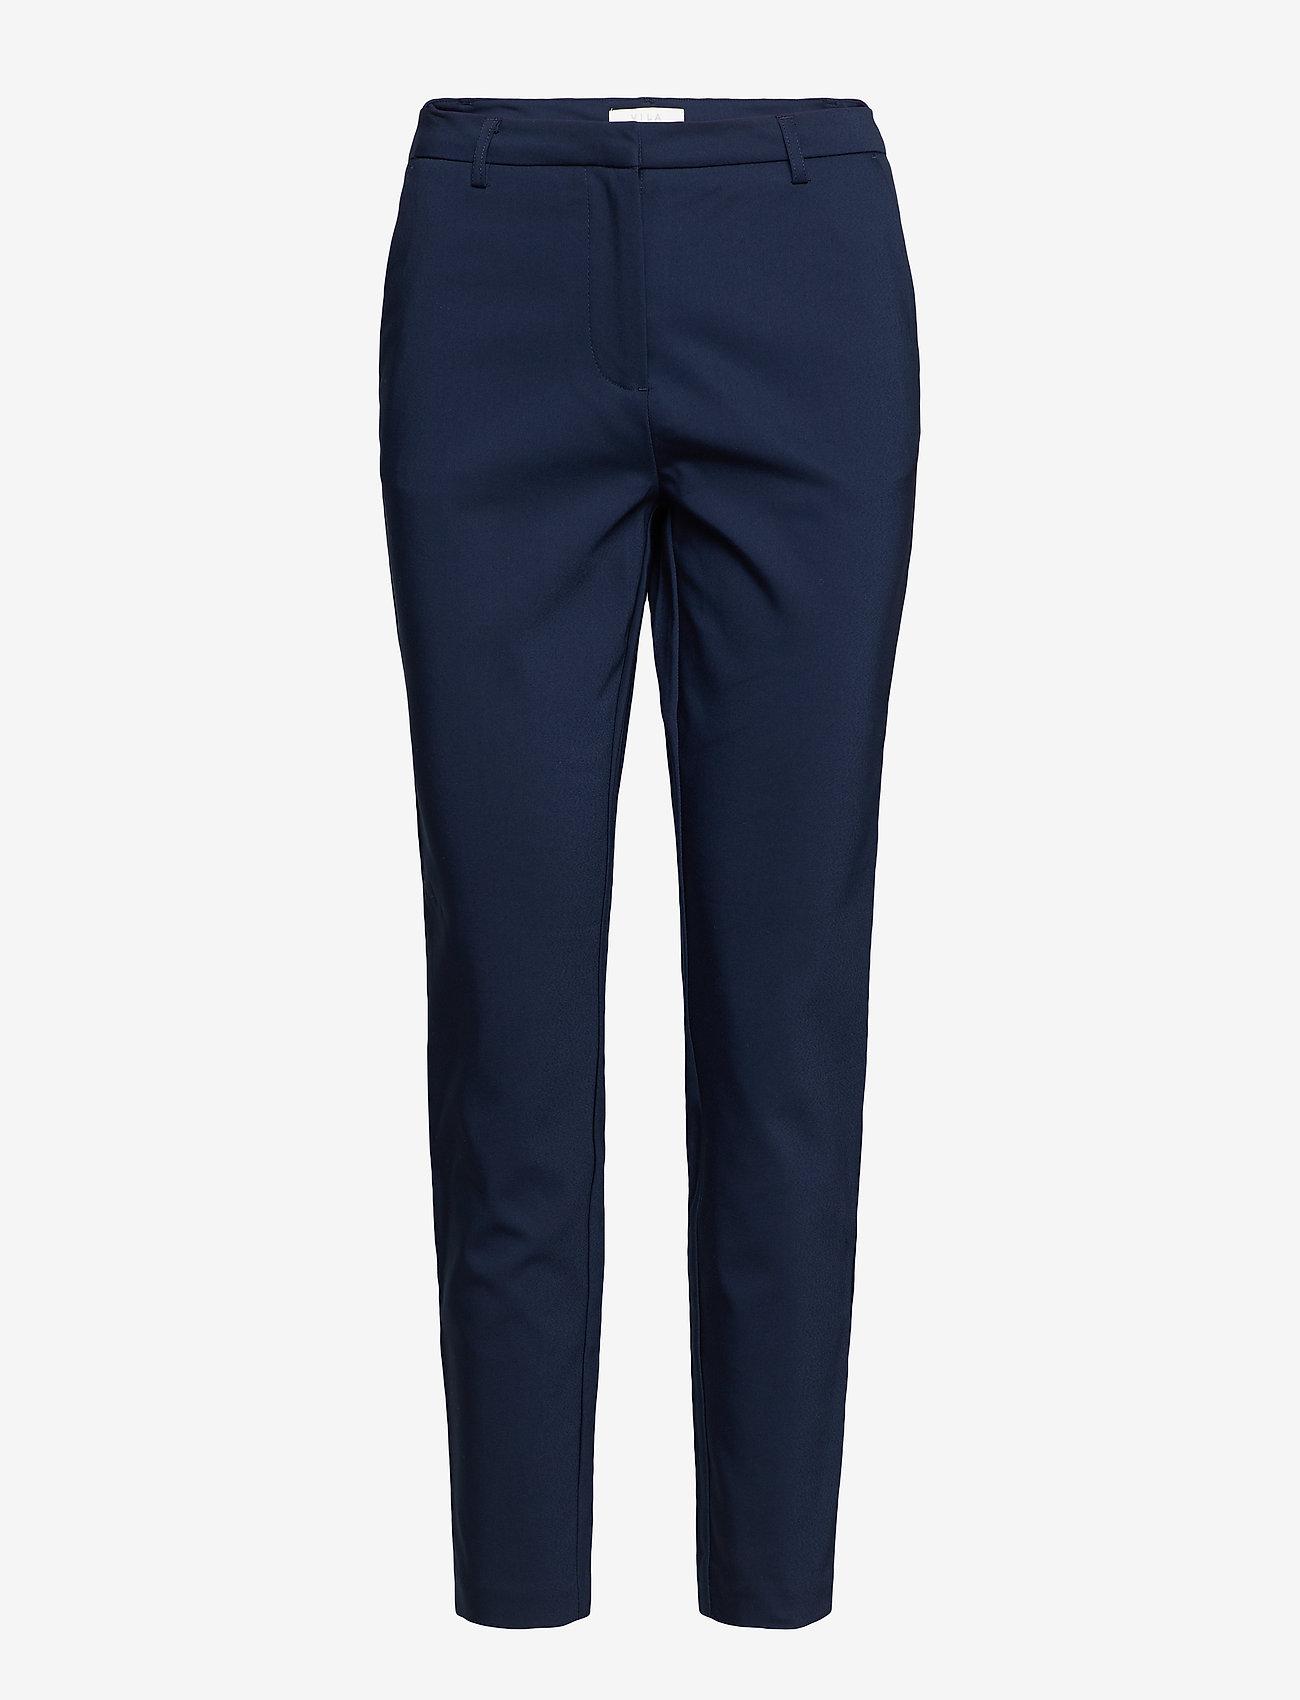 Vila - VIADELIA RWSL 7/8 NEW PANT-NOOS - straight leg trousers - navy blazer - 0